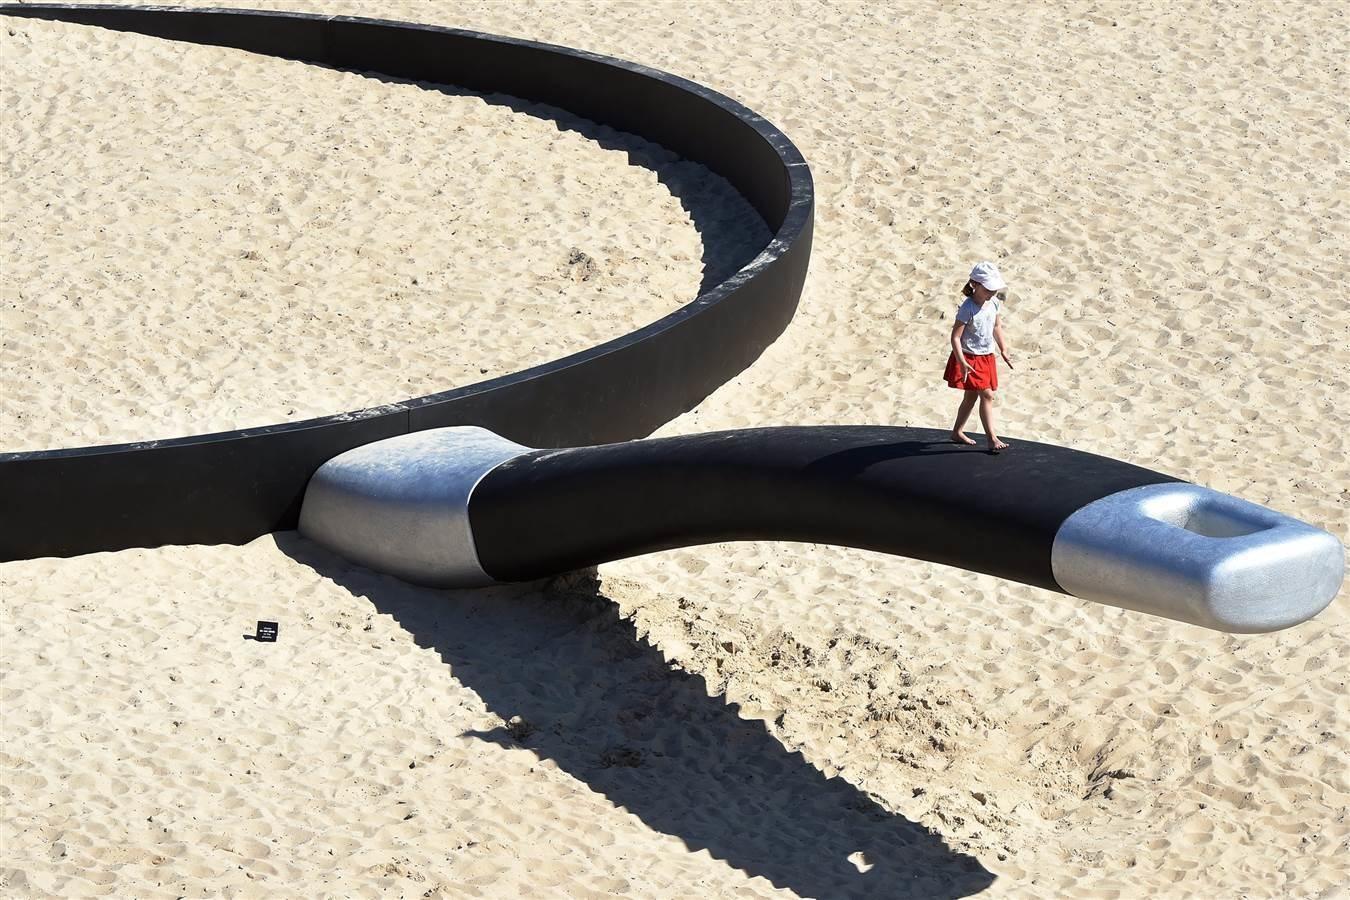 2 -  A Frying pan beach sculpture in Sydney, Australia